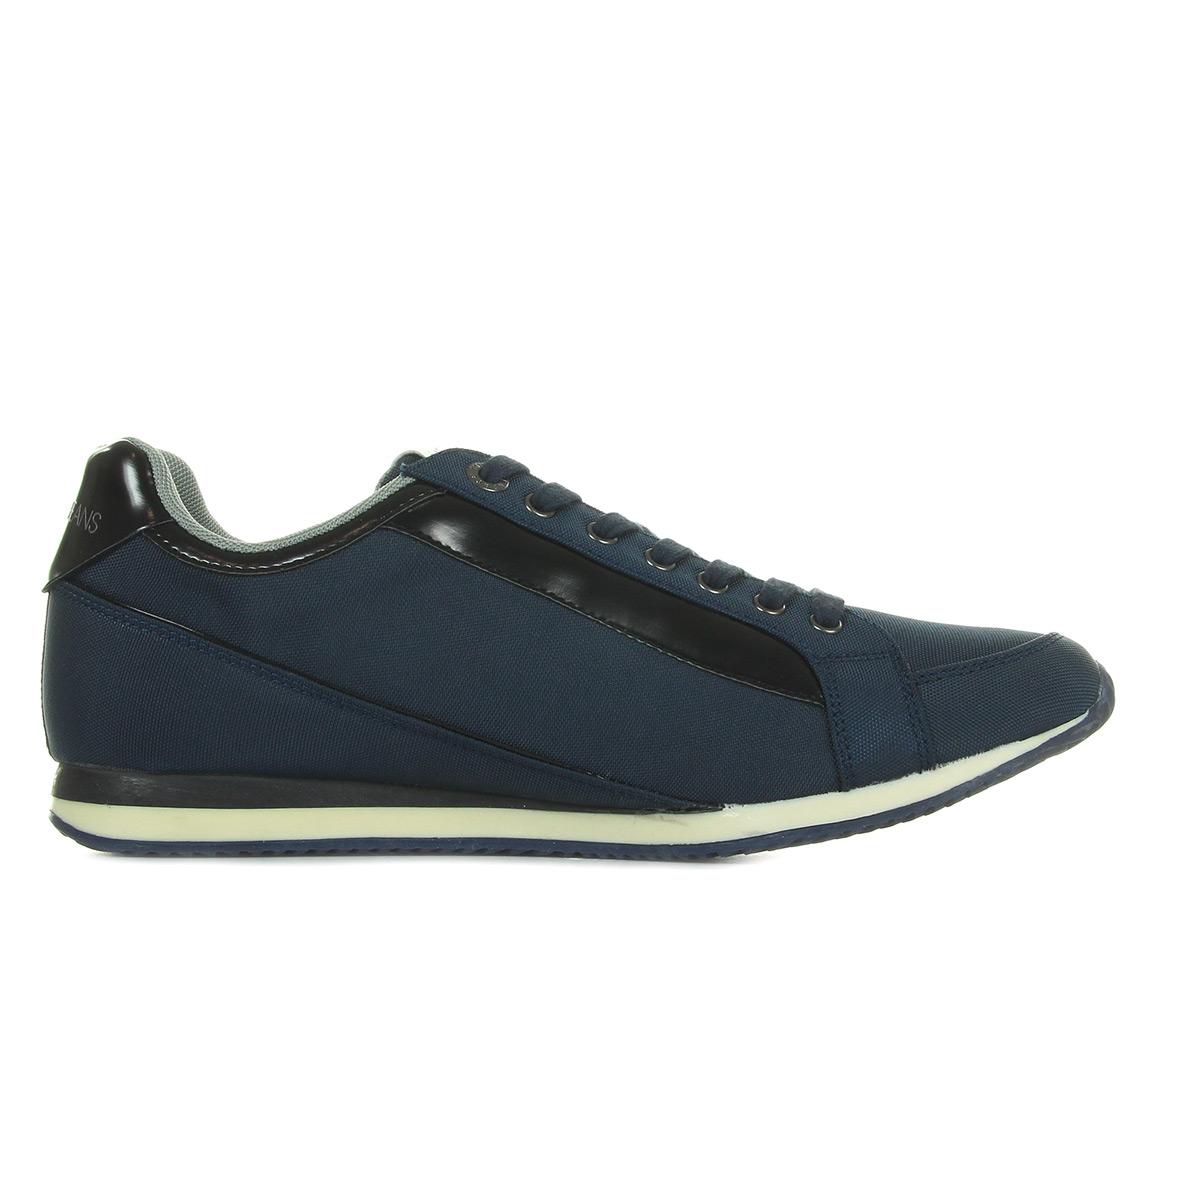 ... Versace Jeans Sneaker Uomo DisA2 Nylon E0YPBSA2239, Baskets mode homme  ... abfbf8aa3f9